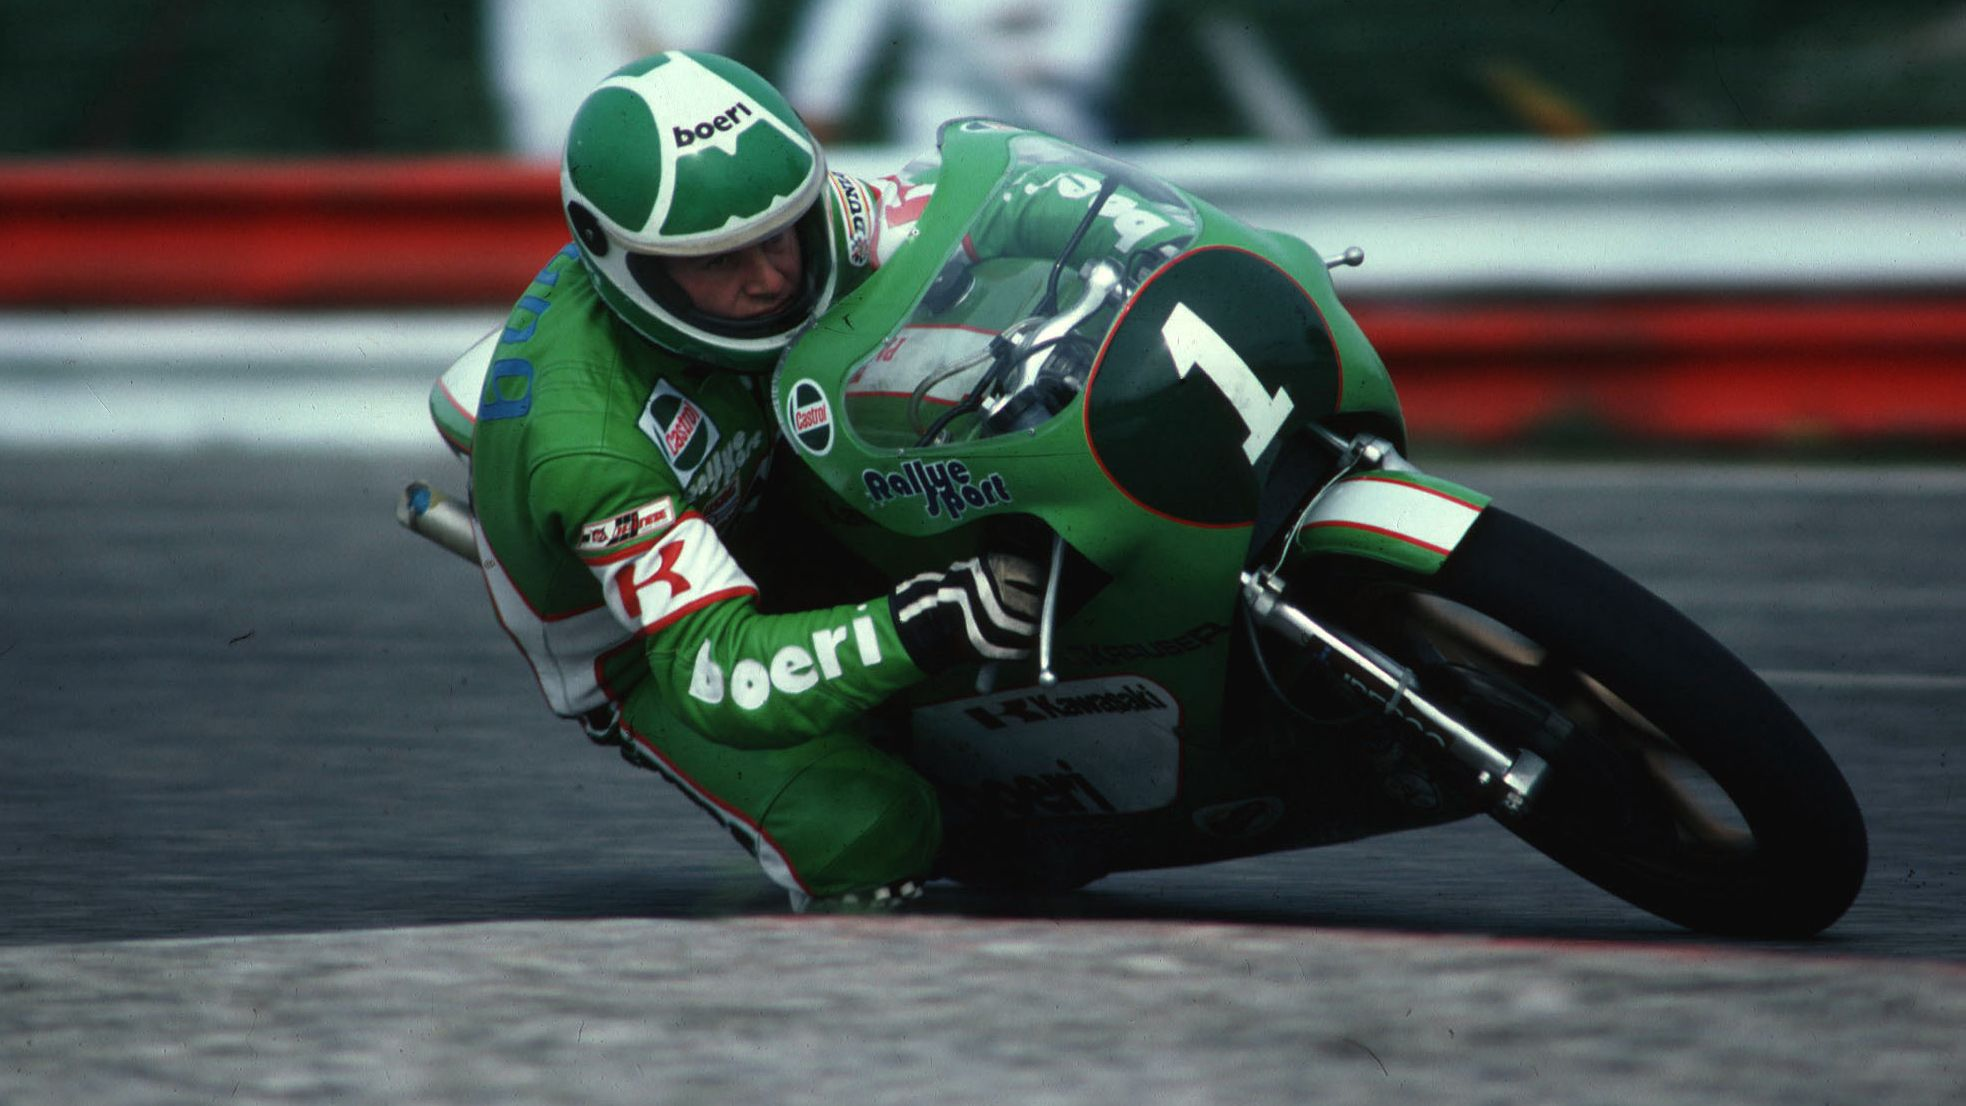 Toni Mang bei einem Grand-Prix-Rennen 1981